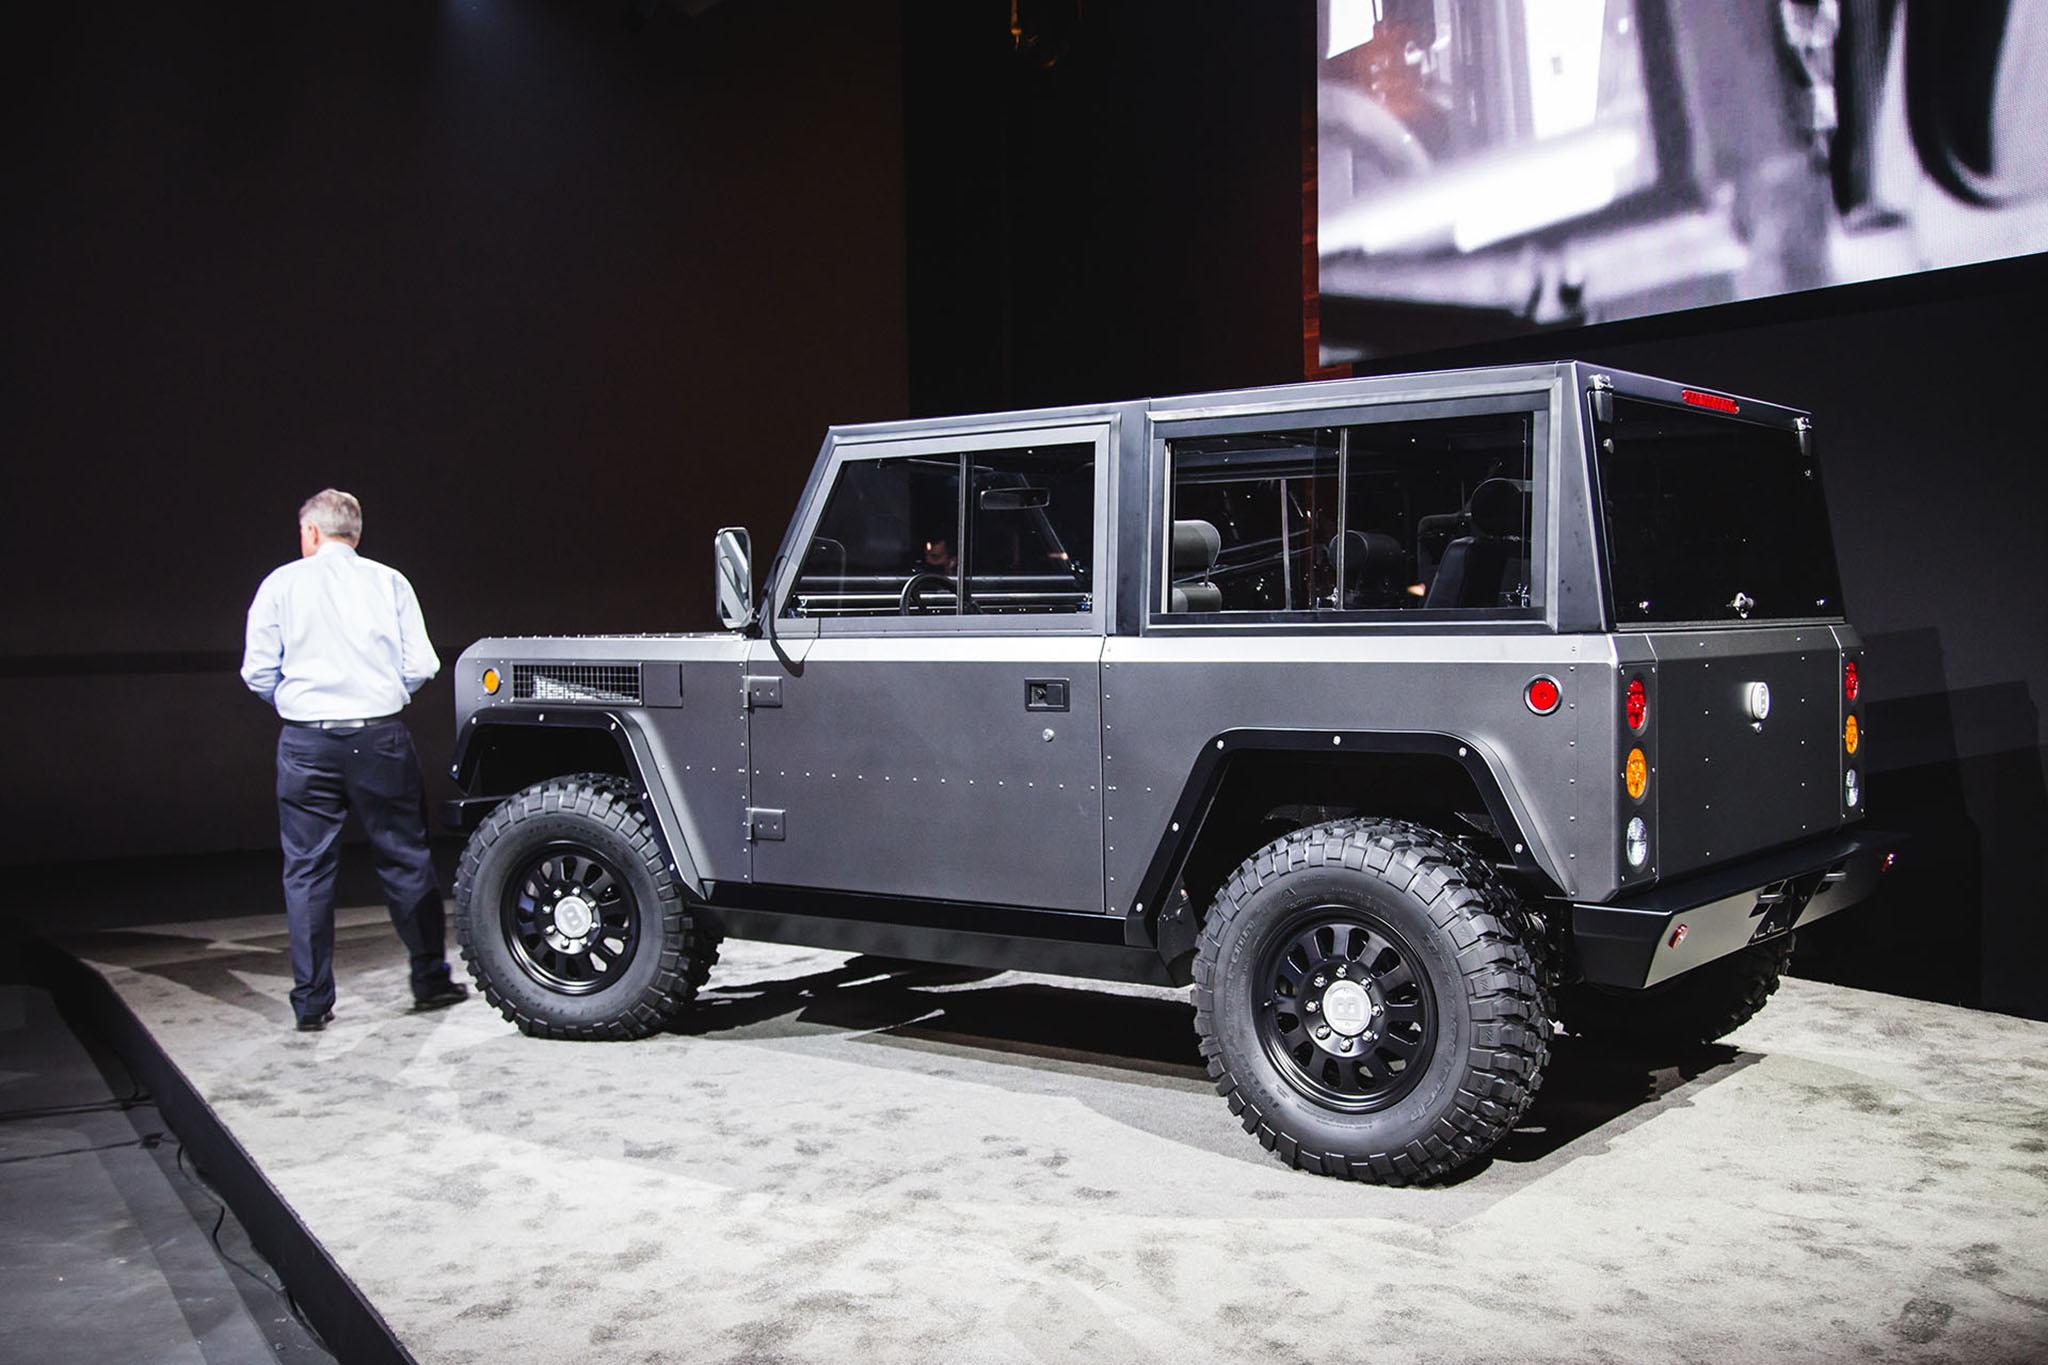 Bollinger B1 Price >> Bollinger Motors Reveals the Custom-Built B1 All-Electric Off-Roader | Automobile Magazine